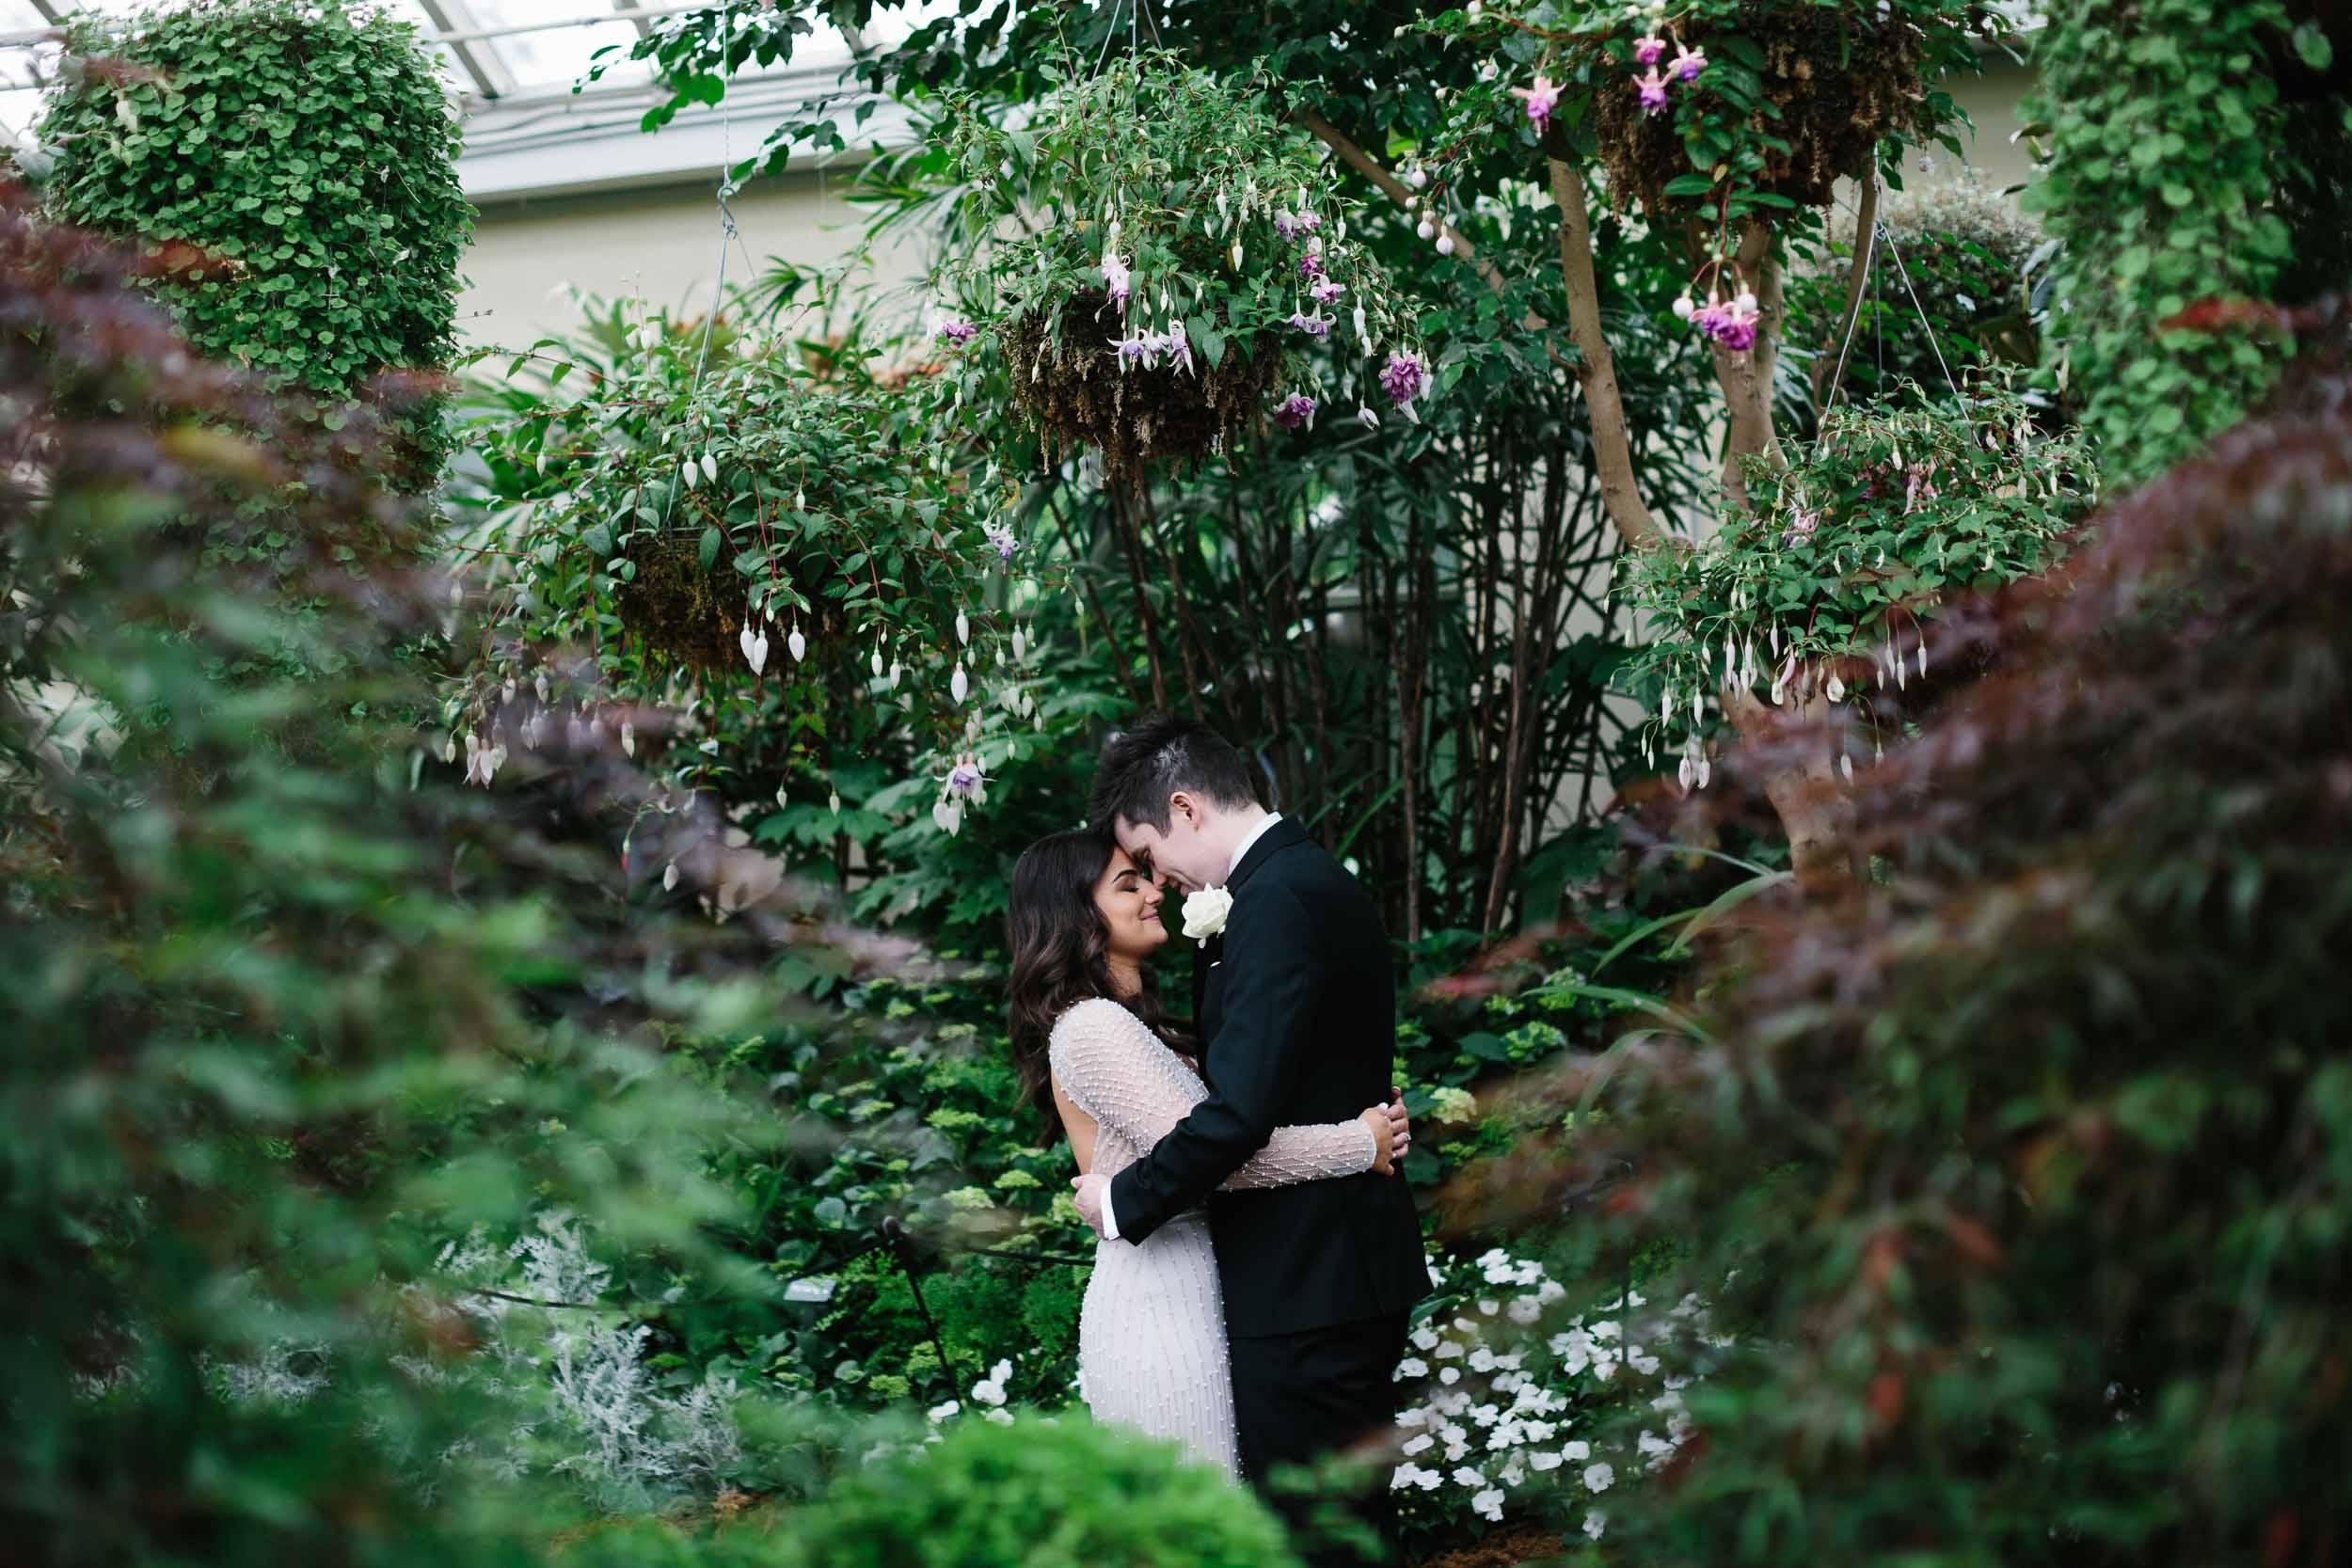 Kas-Richards-Wedding-Photographer-Melbourne-City-Wedding-Alto-Event-Space-Jane-Hill-Bridal-Gown-6.jpg